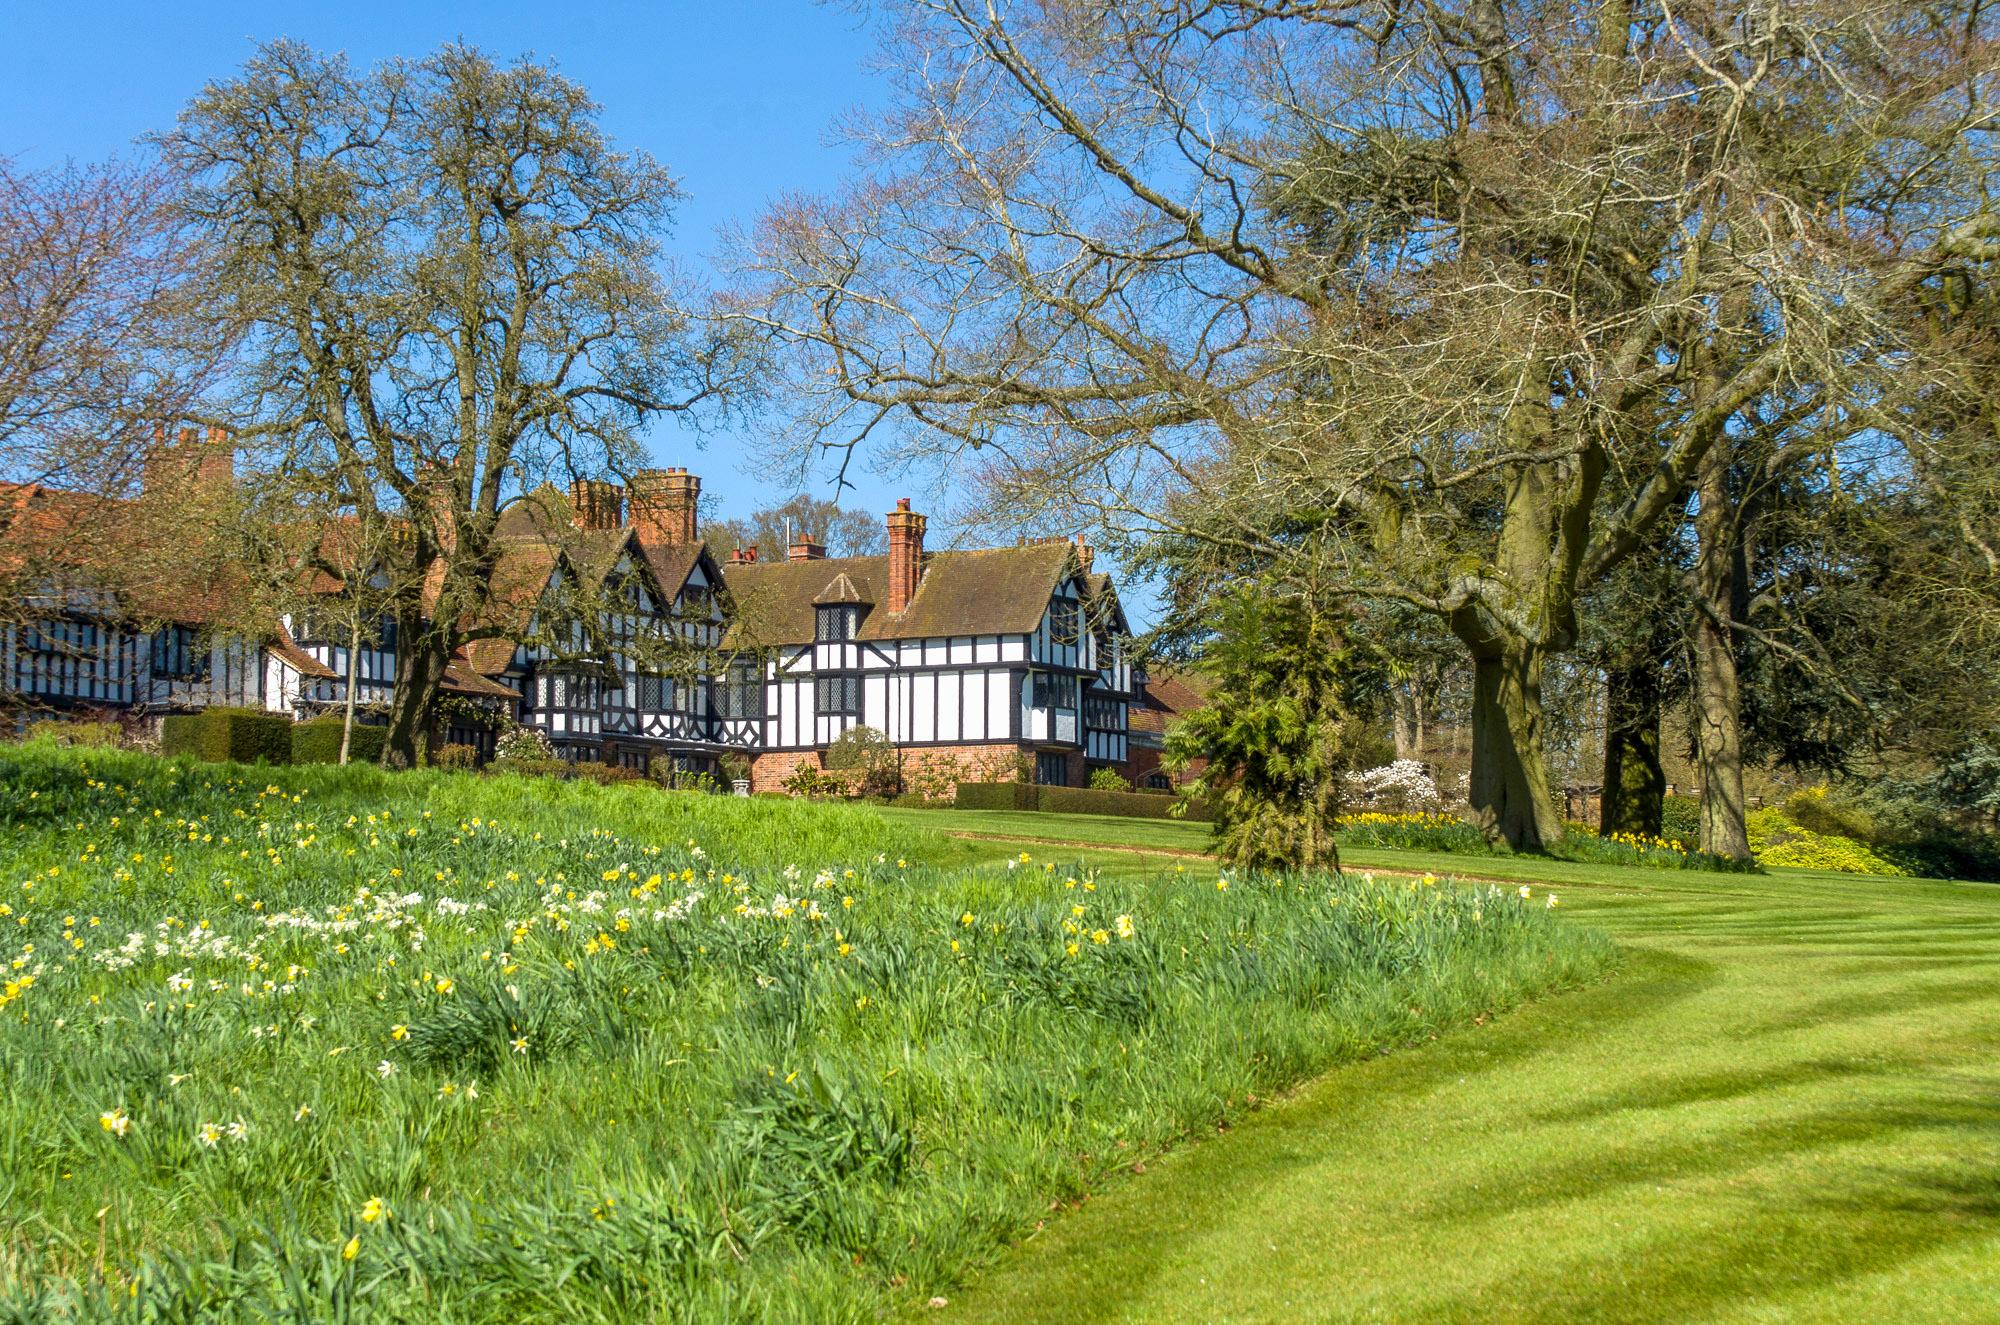 Ascott, Buckinghamshire by Ken Barley.jpg